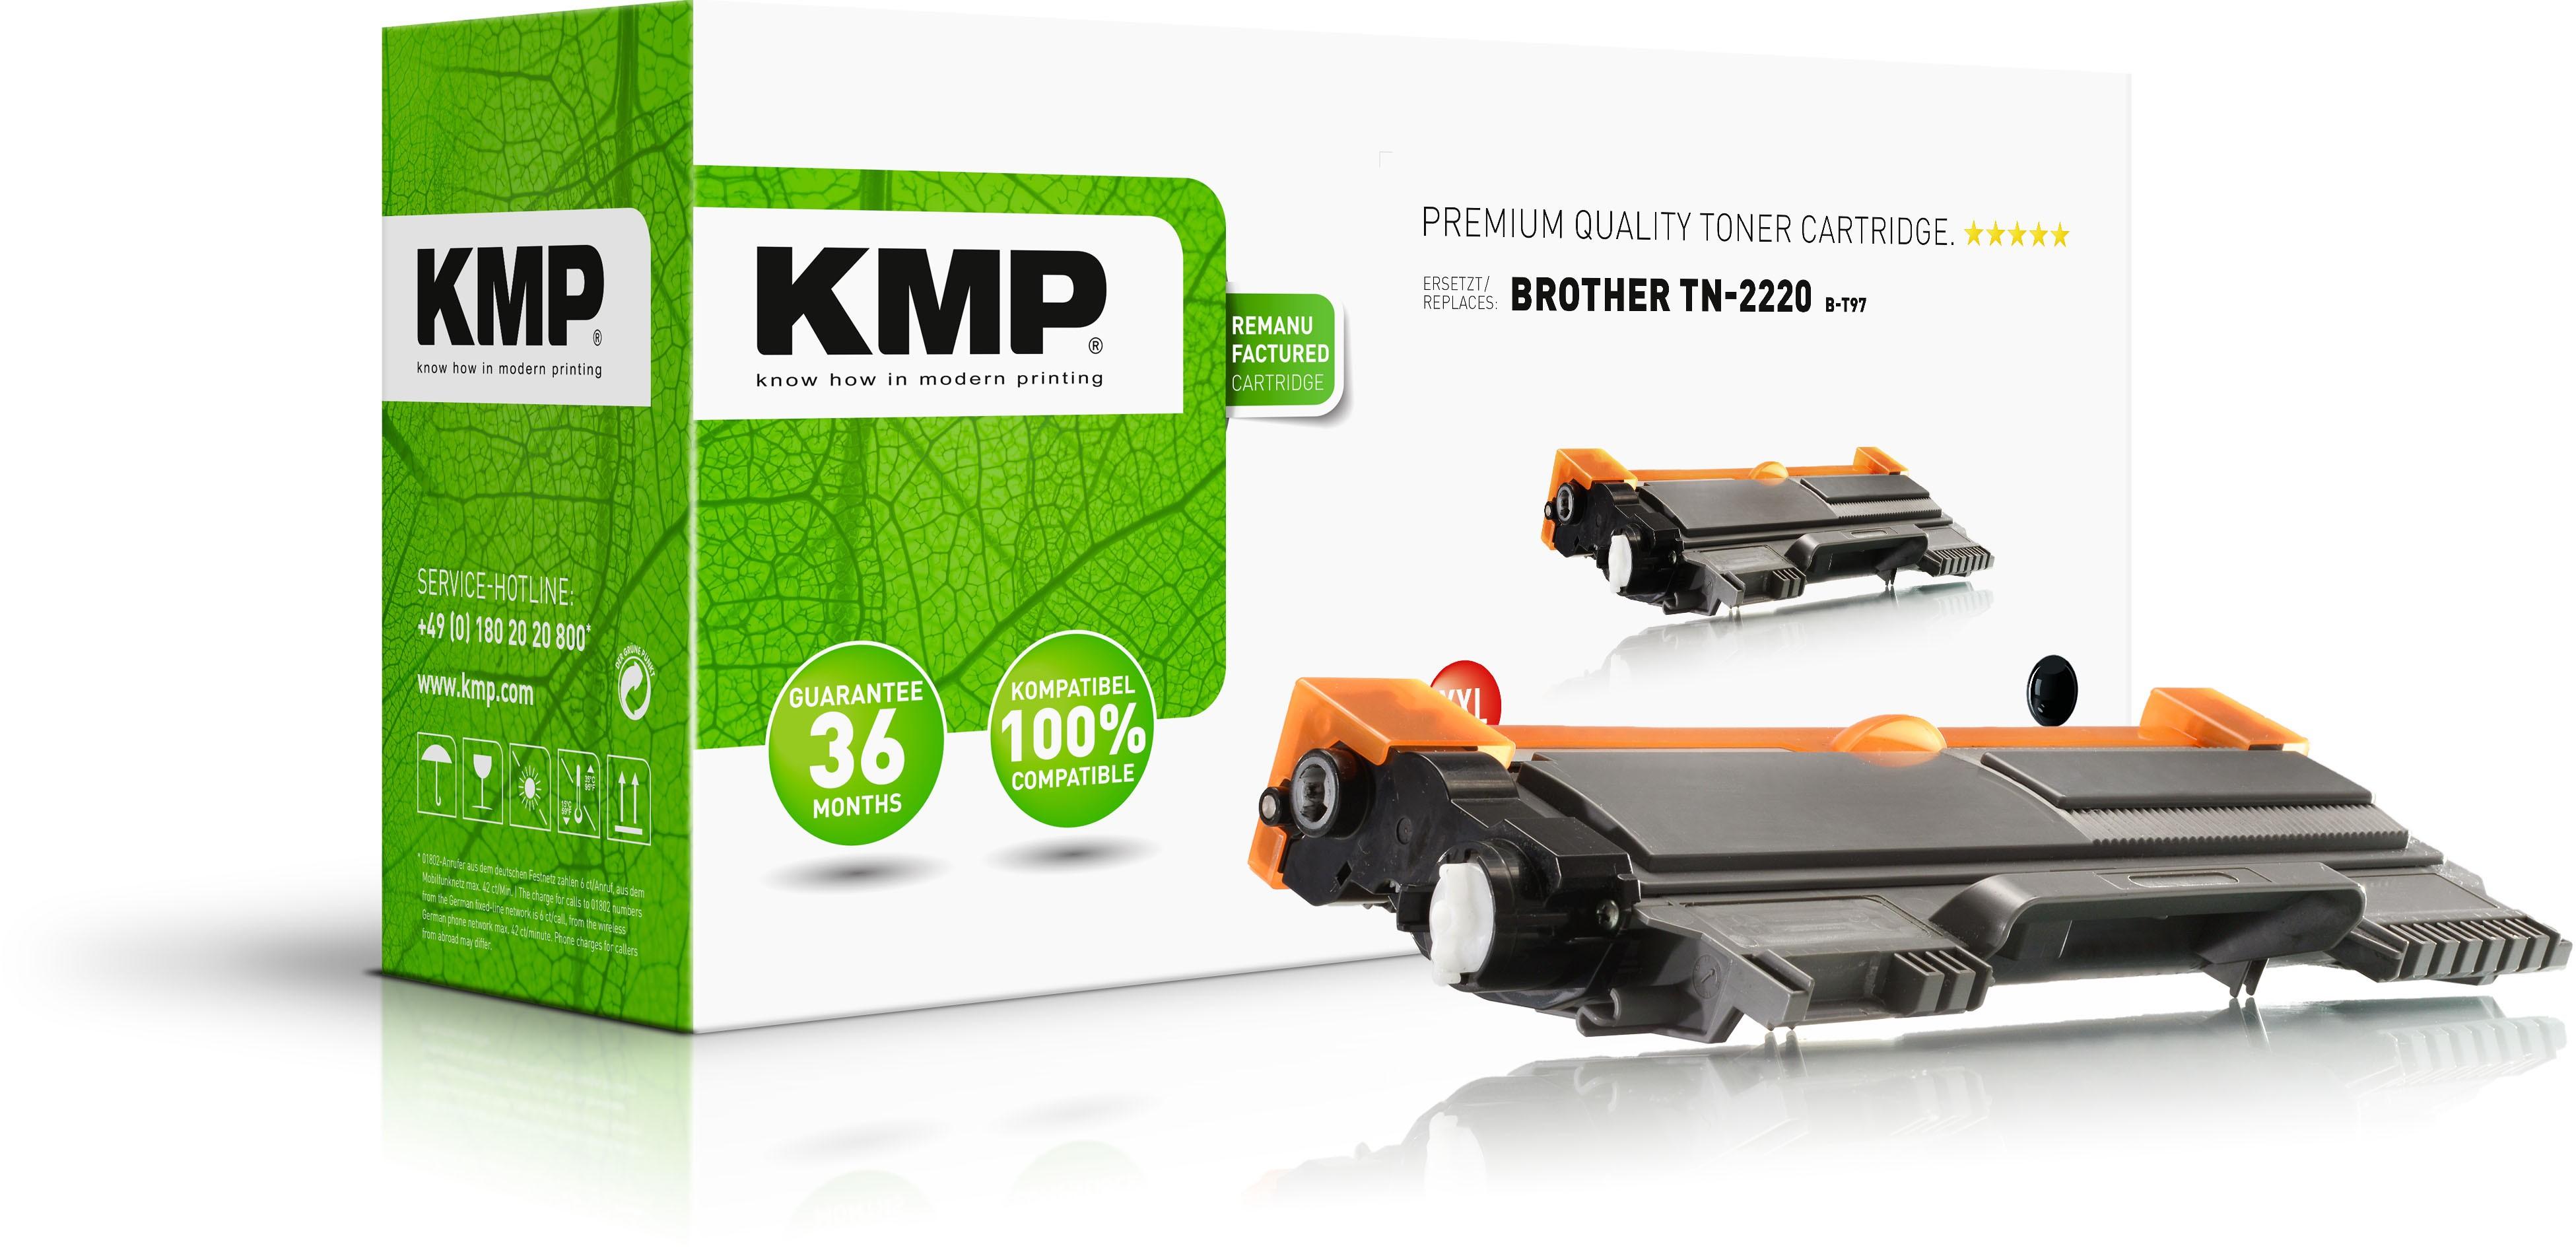 KMP B-T49 schwarz Tonerkartusche ersetzt Brother TN-2220